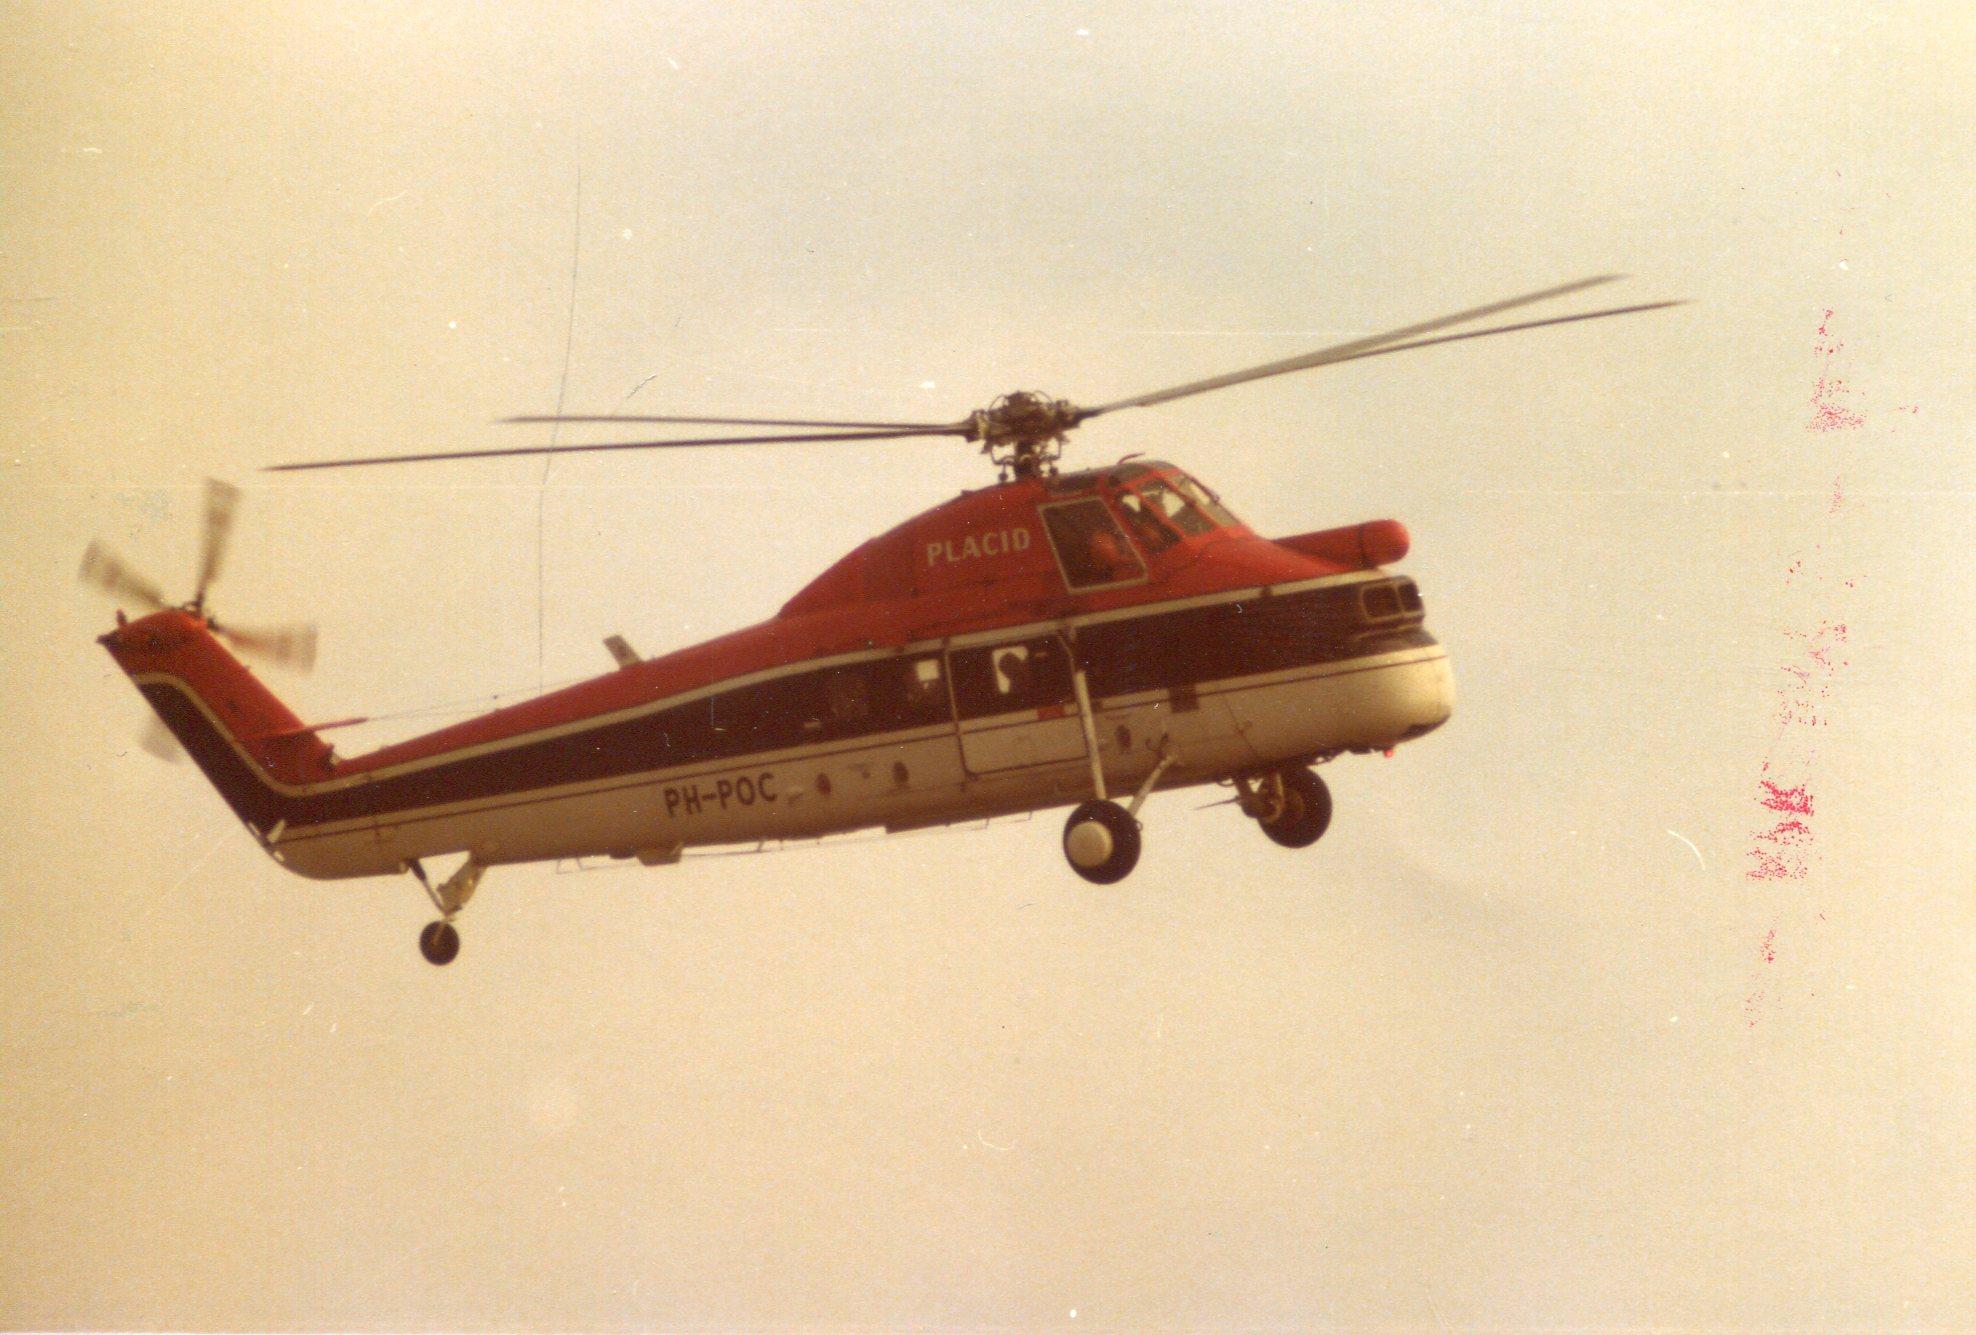 Naam: Den Helder , april 1977 (3).jpg Bekeken: 212 Grootte: 334,4 KB